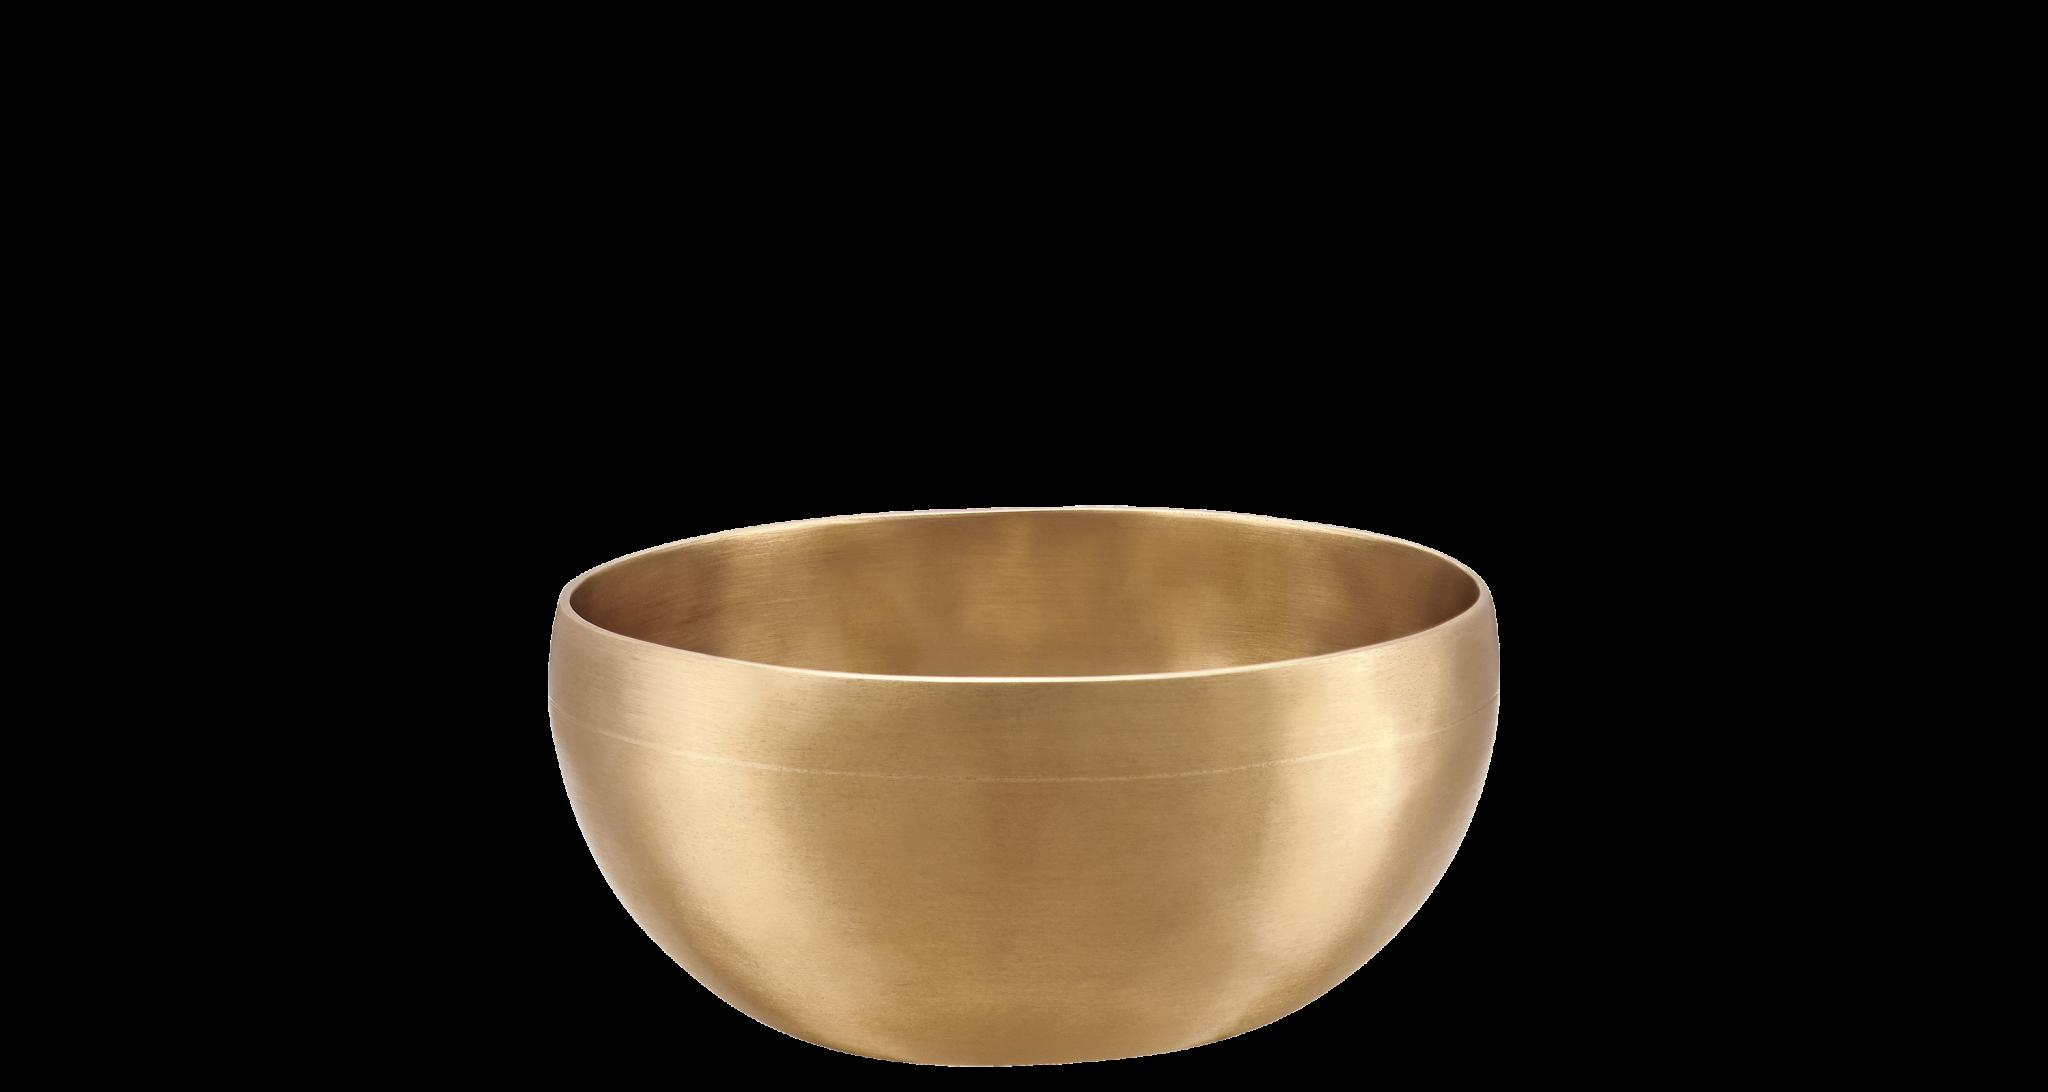 Meinl Meinl Universal Singing Bowl 5.6in